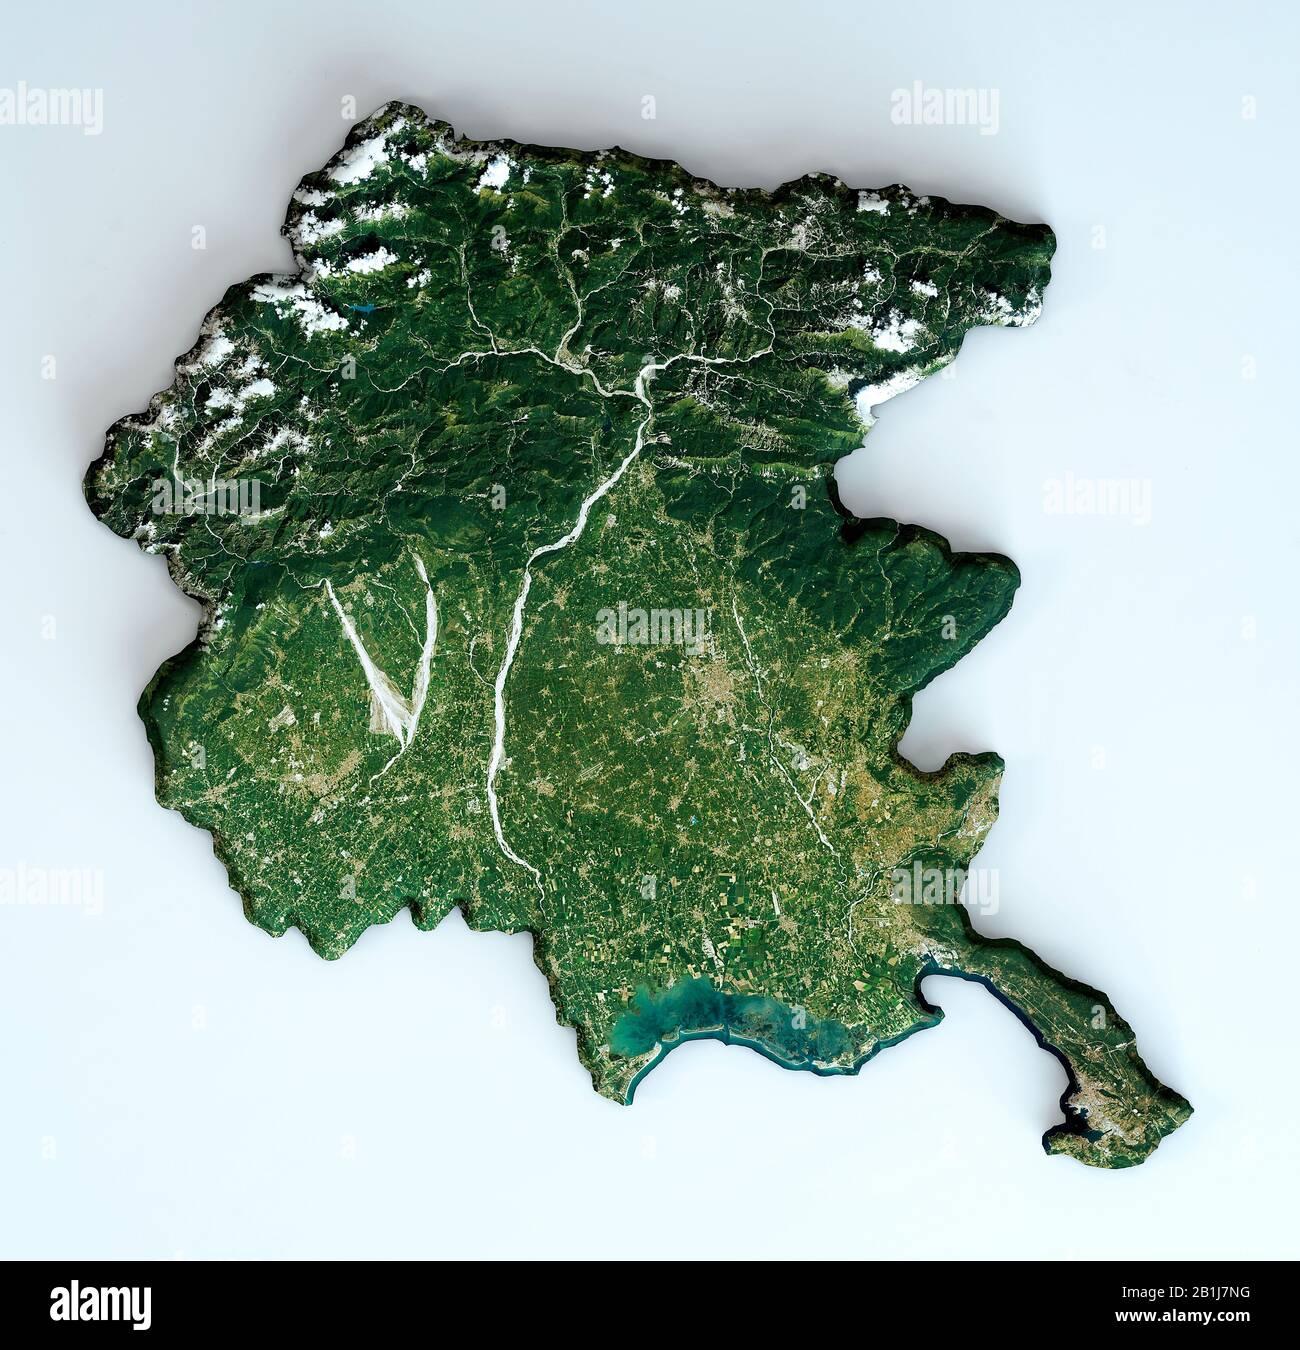 Cartina Friuli Venezia Giulia.Friuli Venezia Giulia Sign High Resolution Stock Photography And Images Alamy